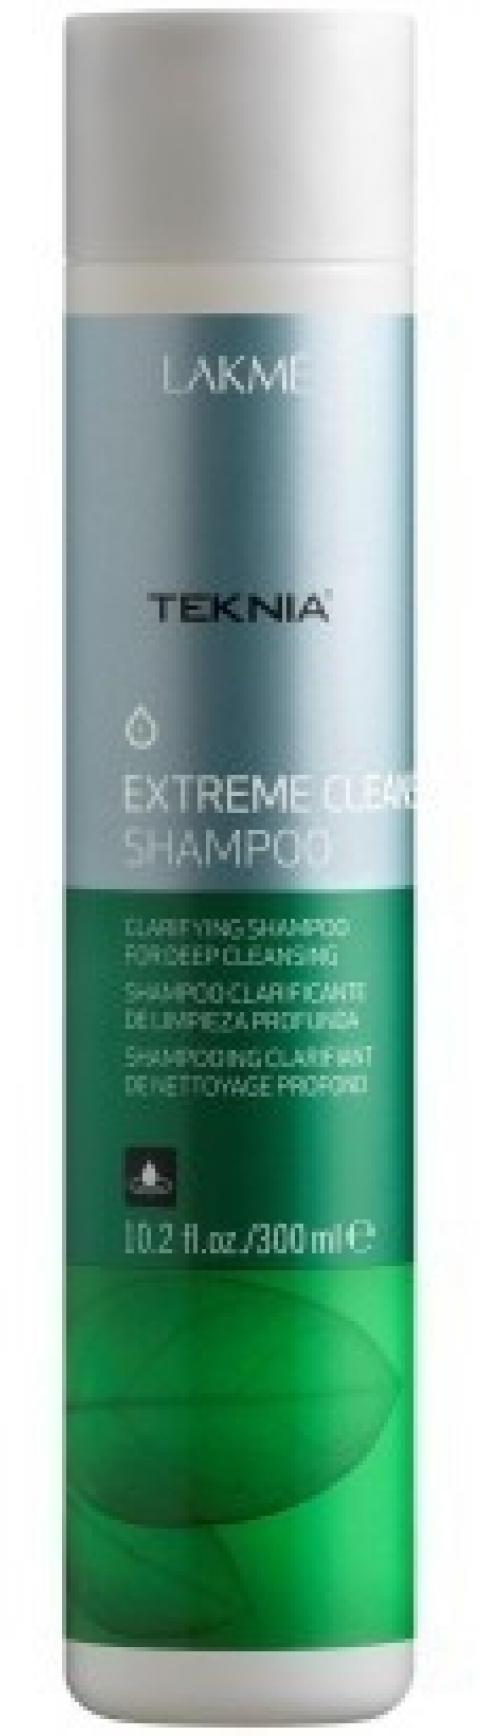 Lakme Шампунь для глубокого очищения Shampoo, 100 мл shampoo herbal шампунь для глубокого очищения 5 л